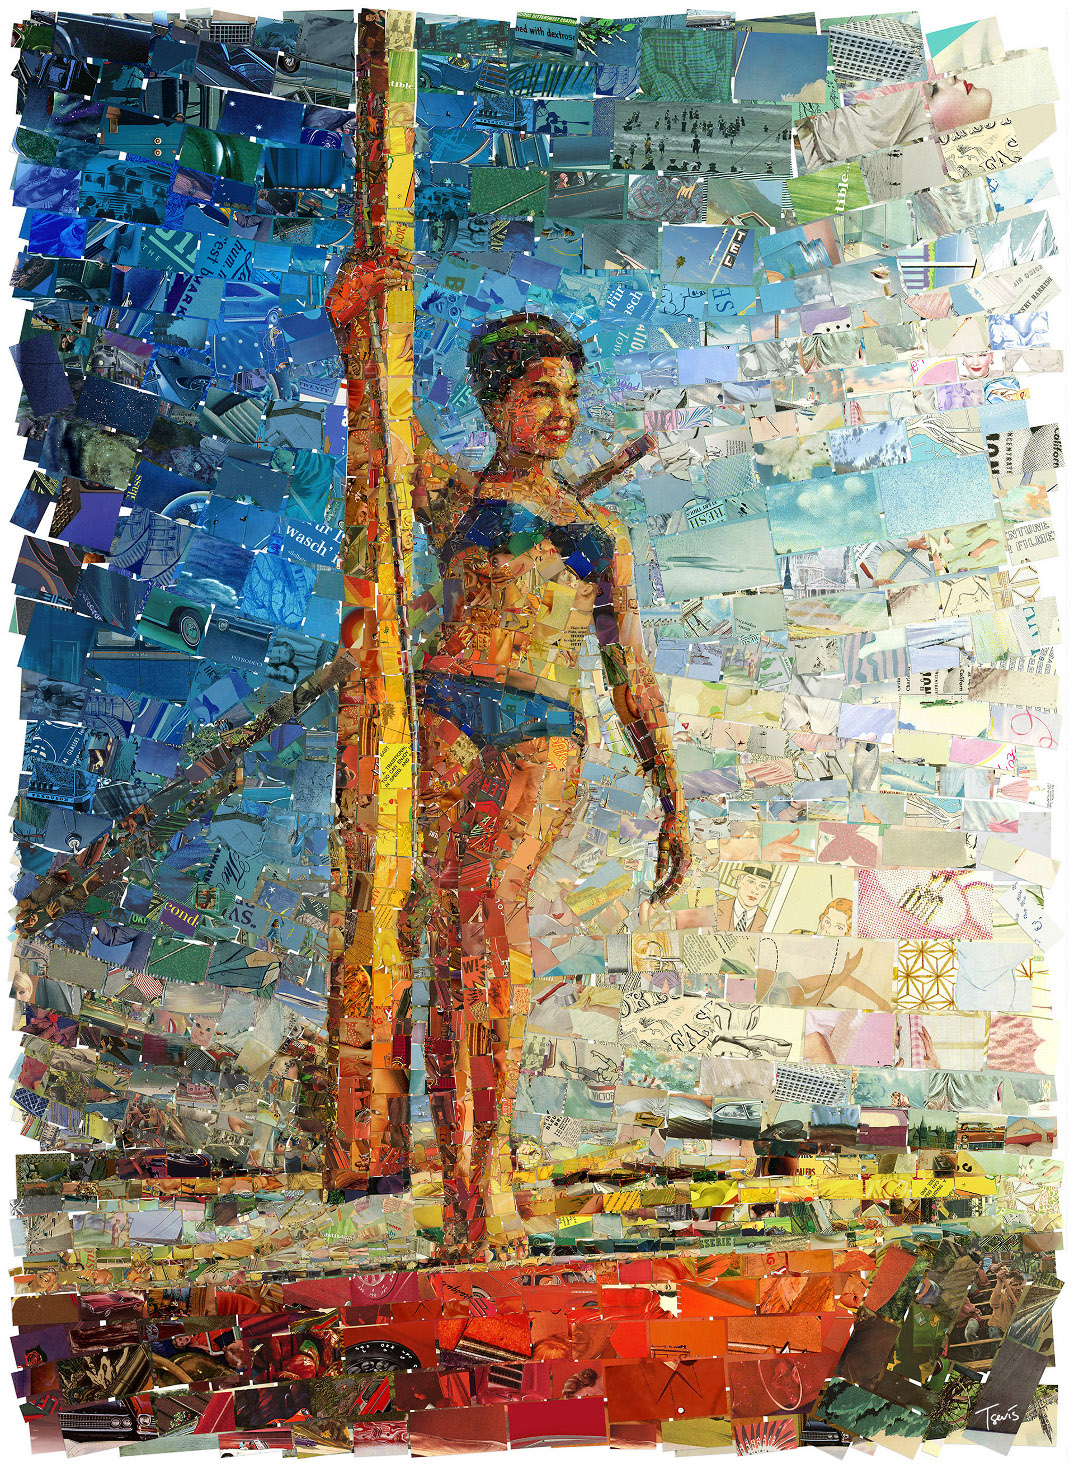 mosaici-collage-riviste-anni-50-60-endless-summer-charis-tsevis-01